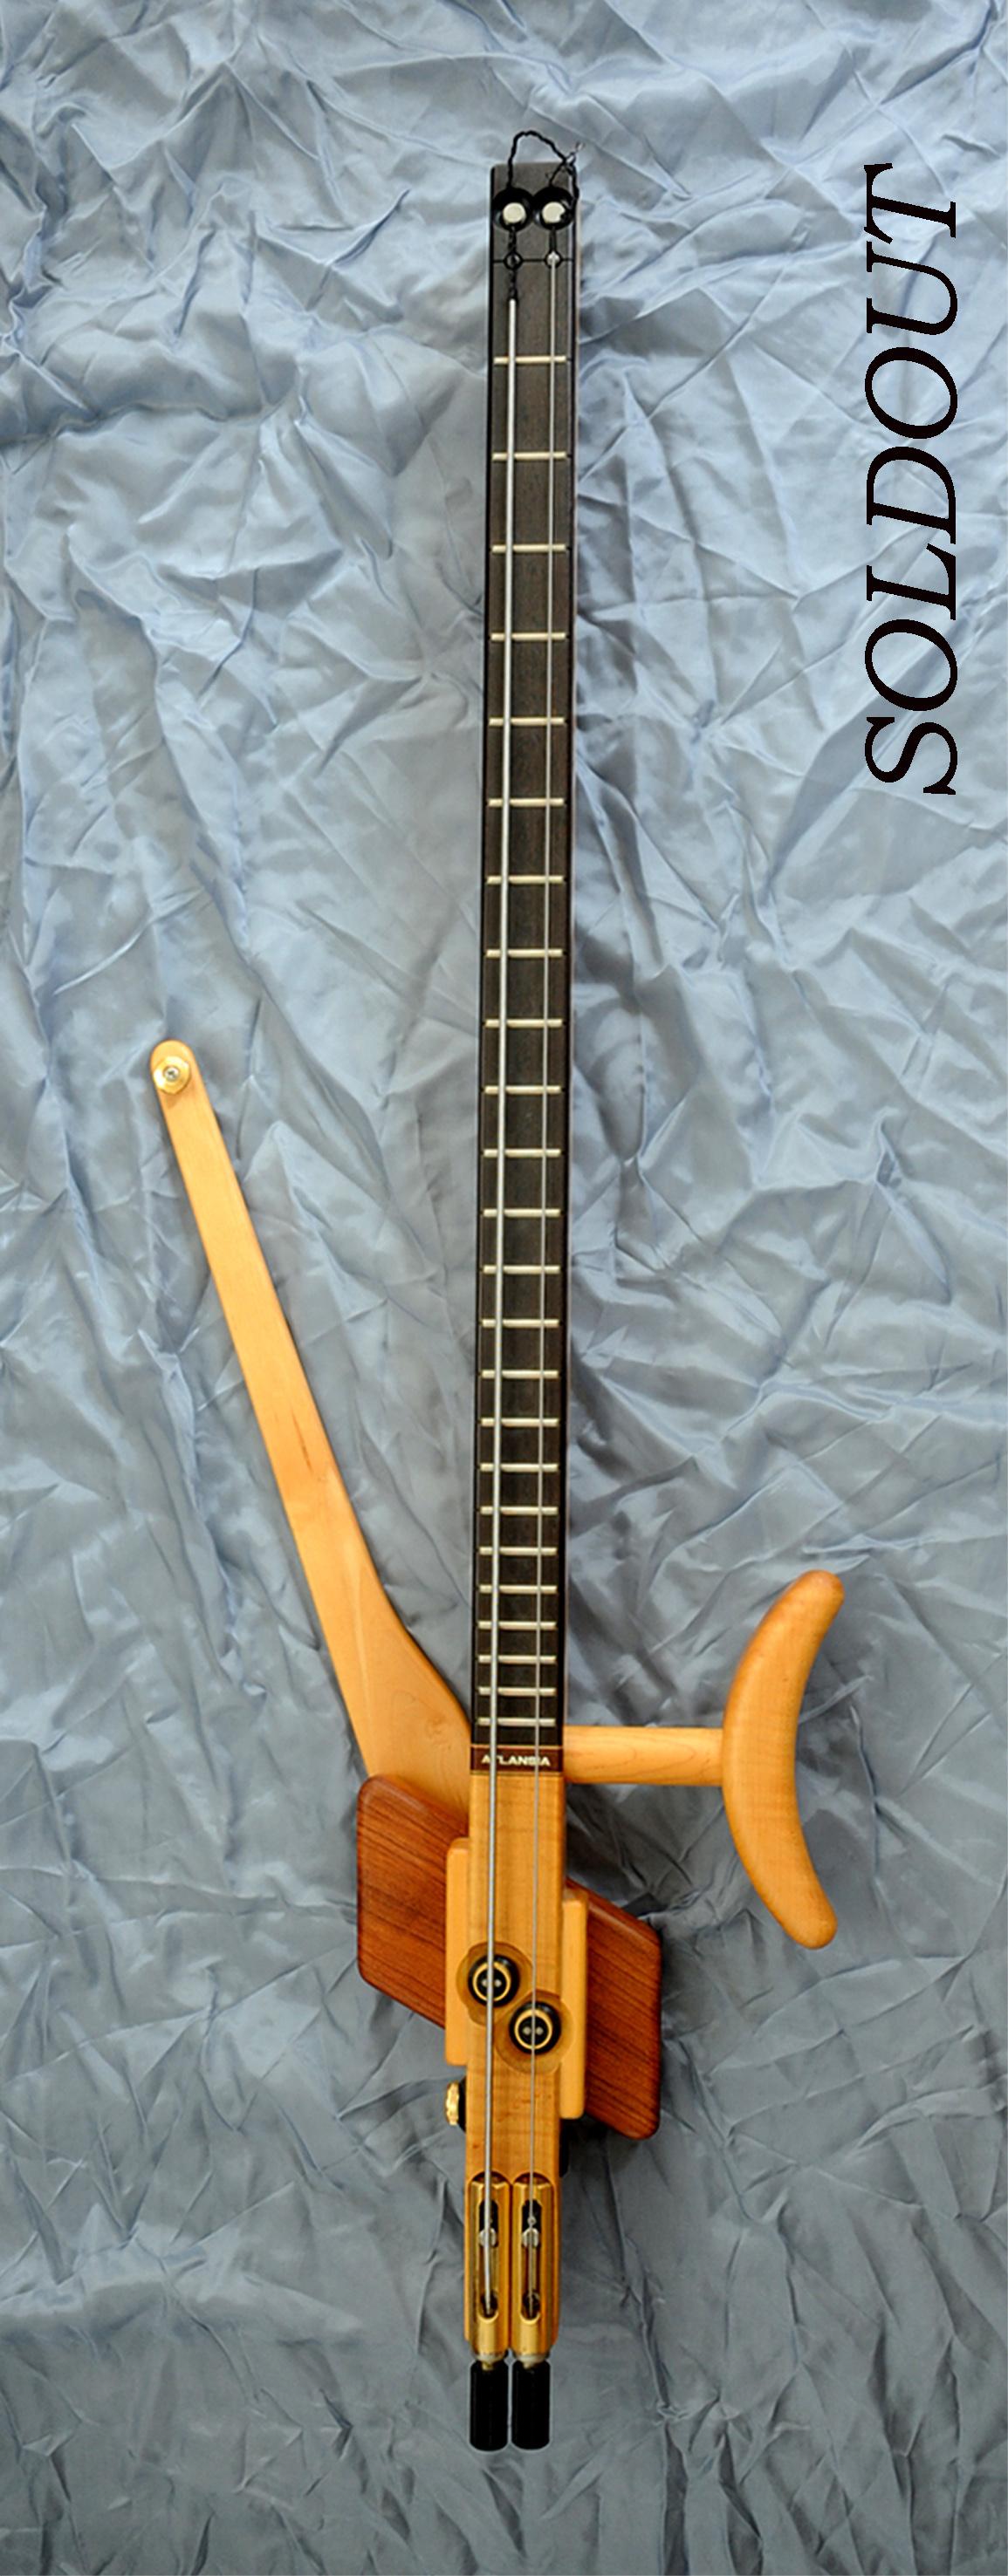 bushdog 39 s tumblr atlansia dualist 2 string bass. Black Bedroom Furniture Sets. Home Design Ideas